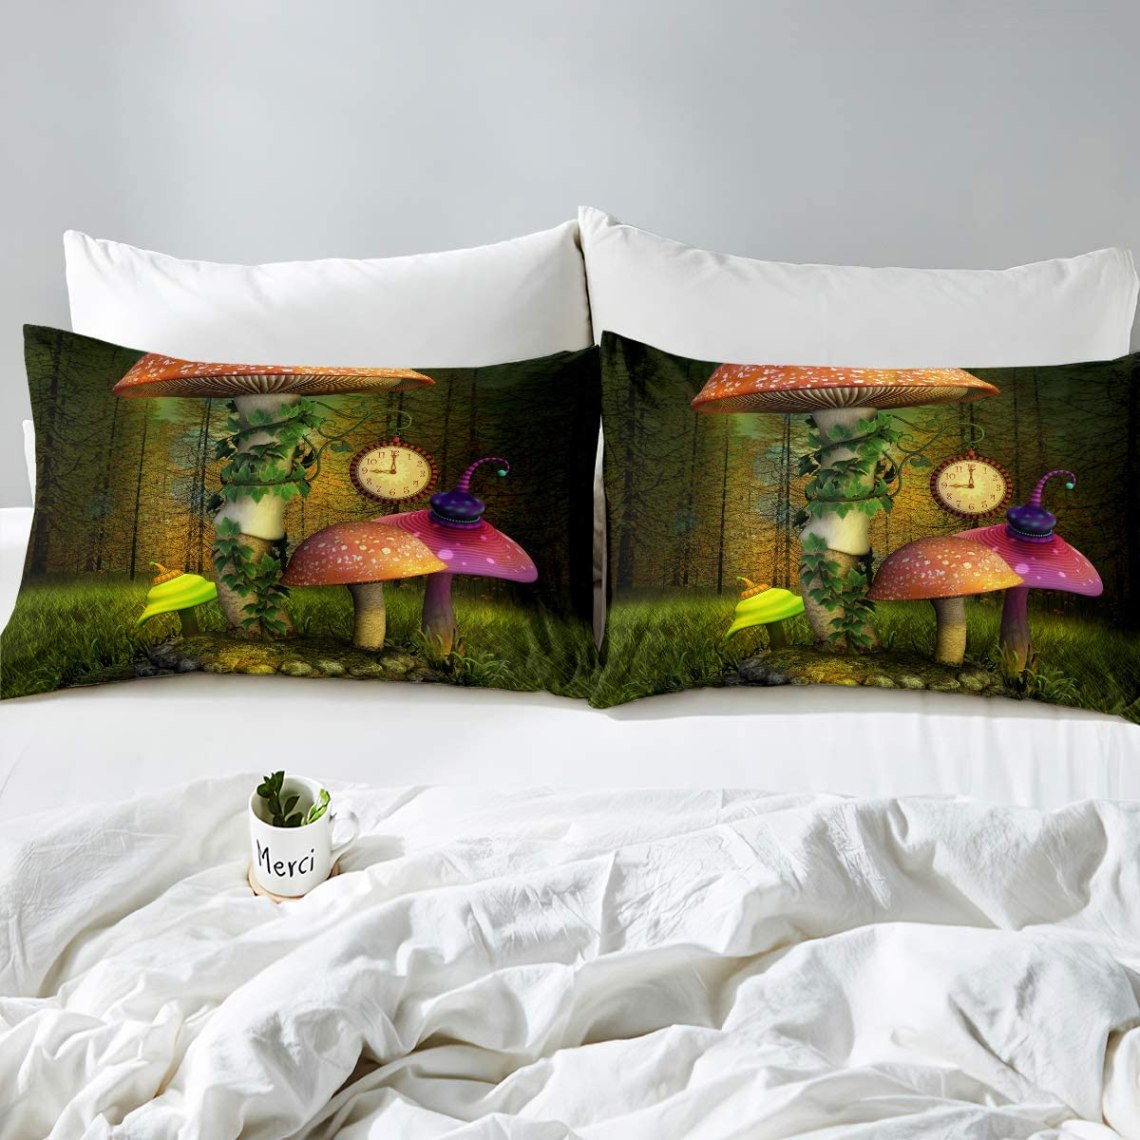 Buy Nursery Mushroom Bedding Set Kids Fairy Forest Comforter Cover Magic Lilliputian Cartoon Fungus Plant Duvet Cover Anime World Clock Fantasy Garden Bedclothes 3pcs Queen Size Green Child Room Decor Online In